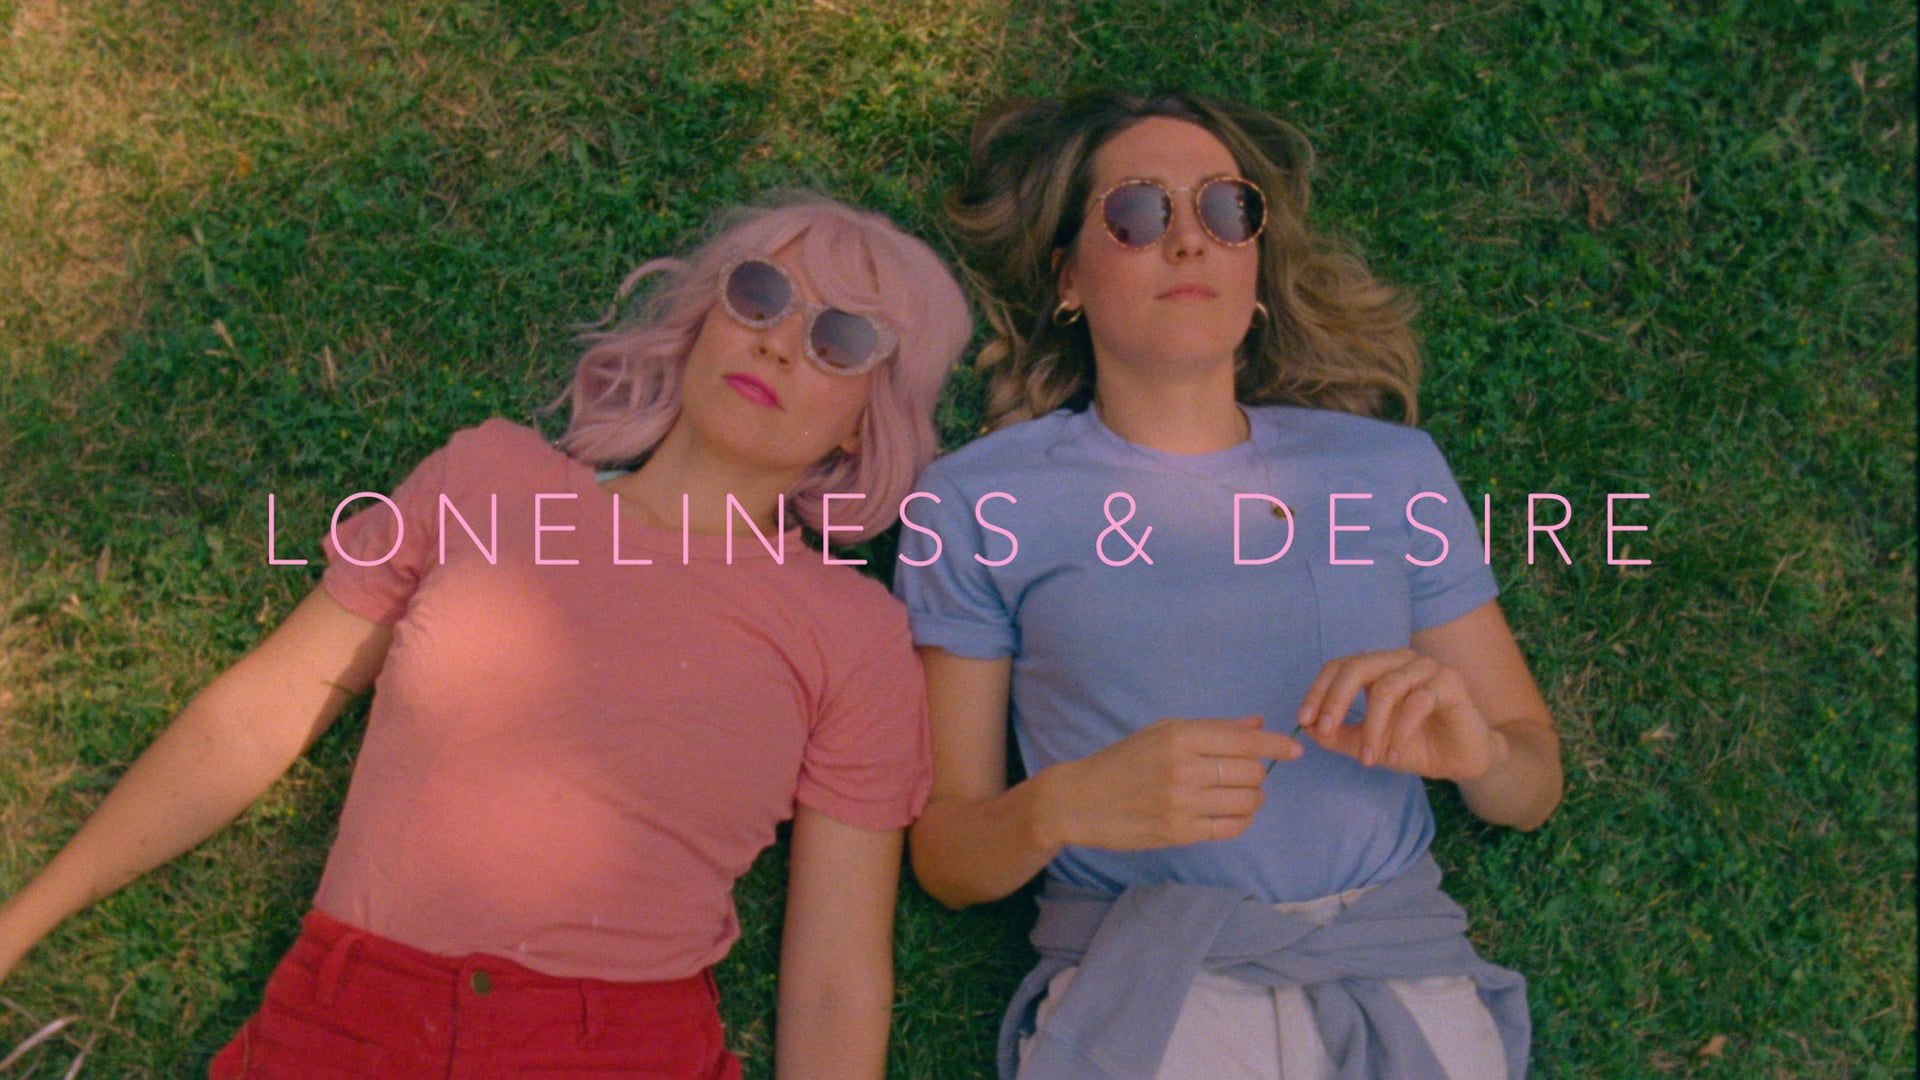 LONELINESS & DESIRE - trailer